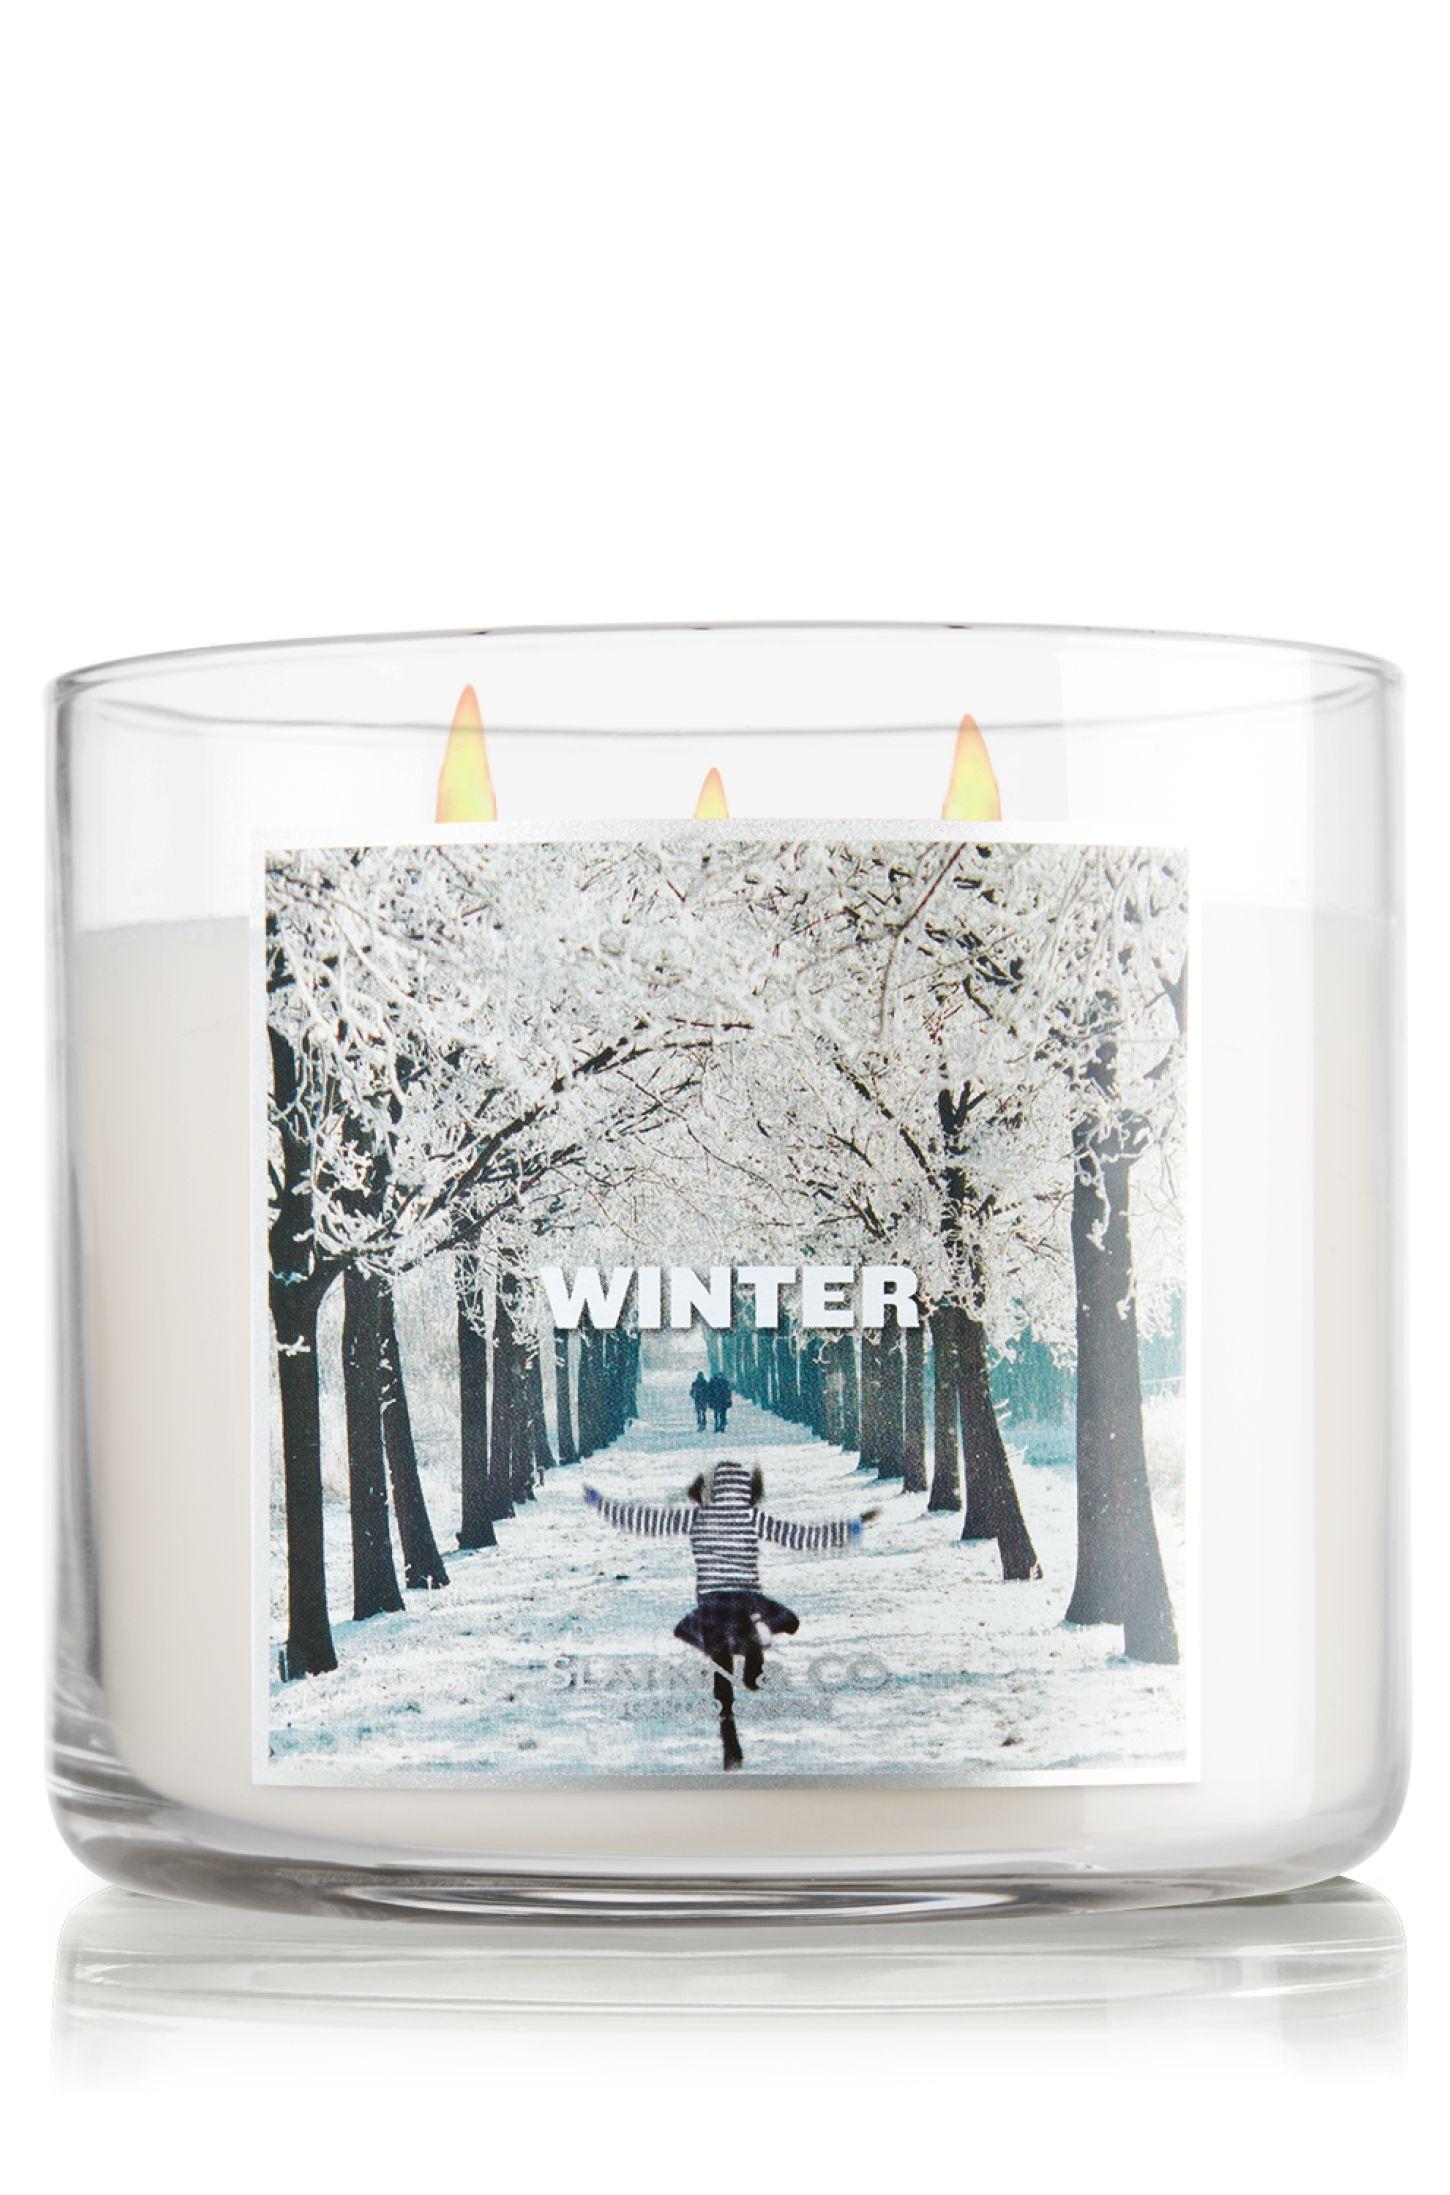 Winter 14.5 oz. 3-Wick Candle - Slatkin & Co. - Bath ...